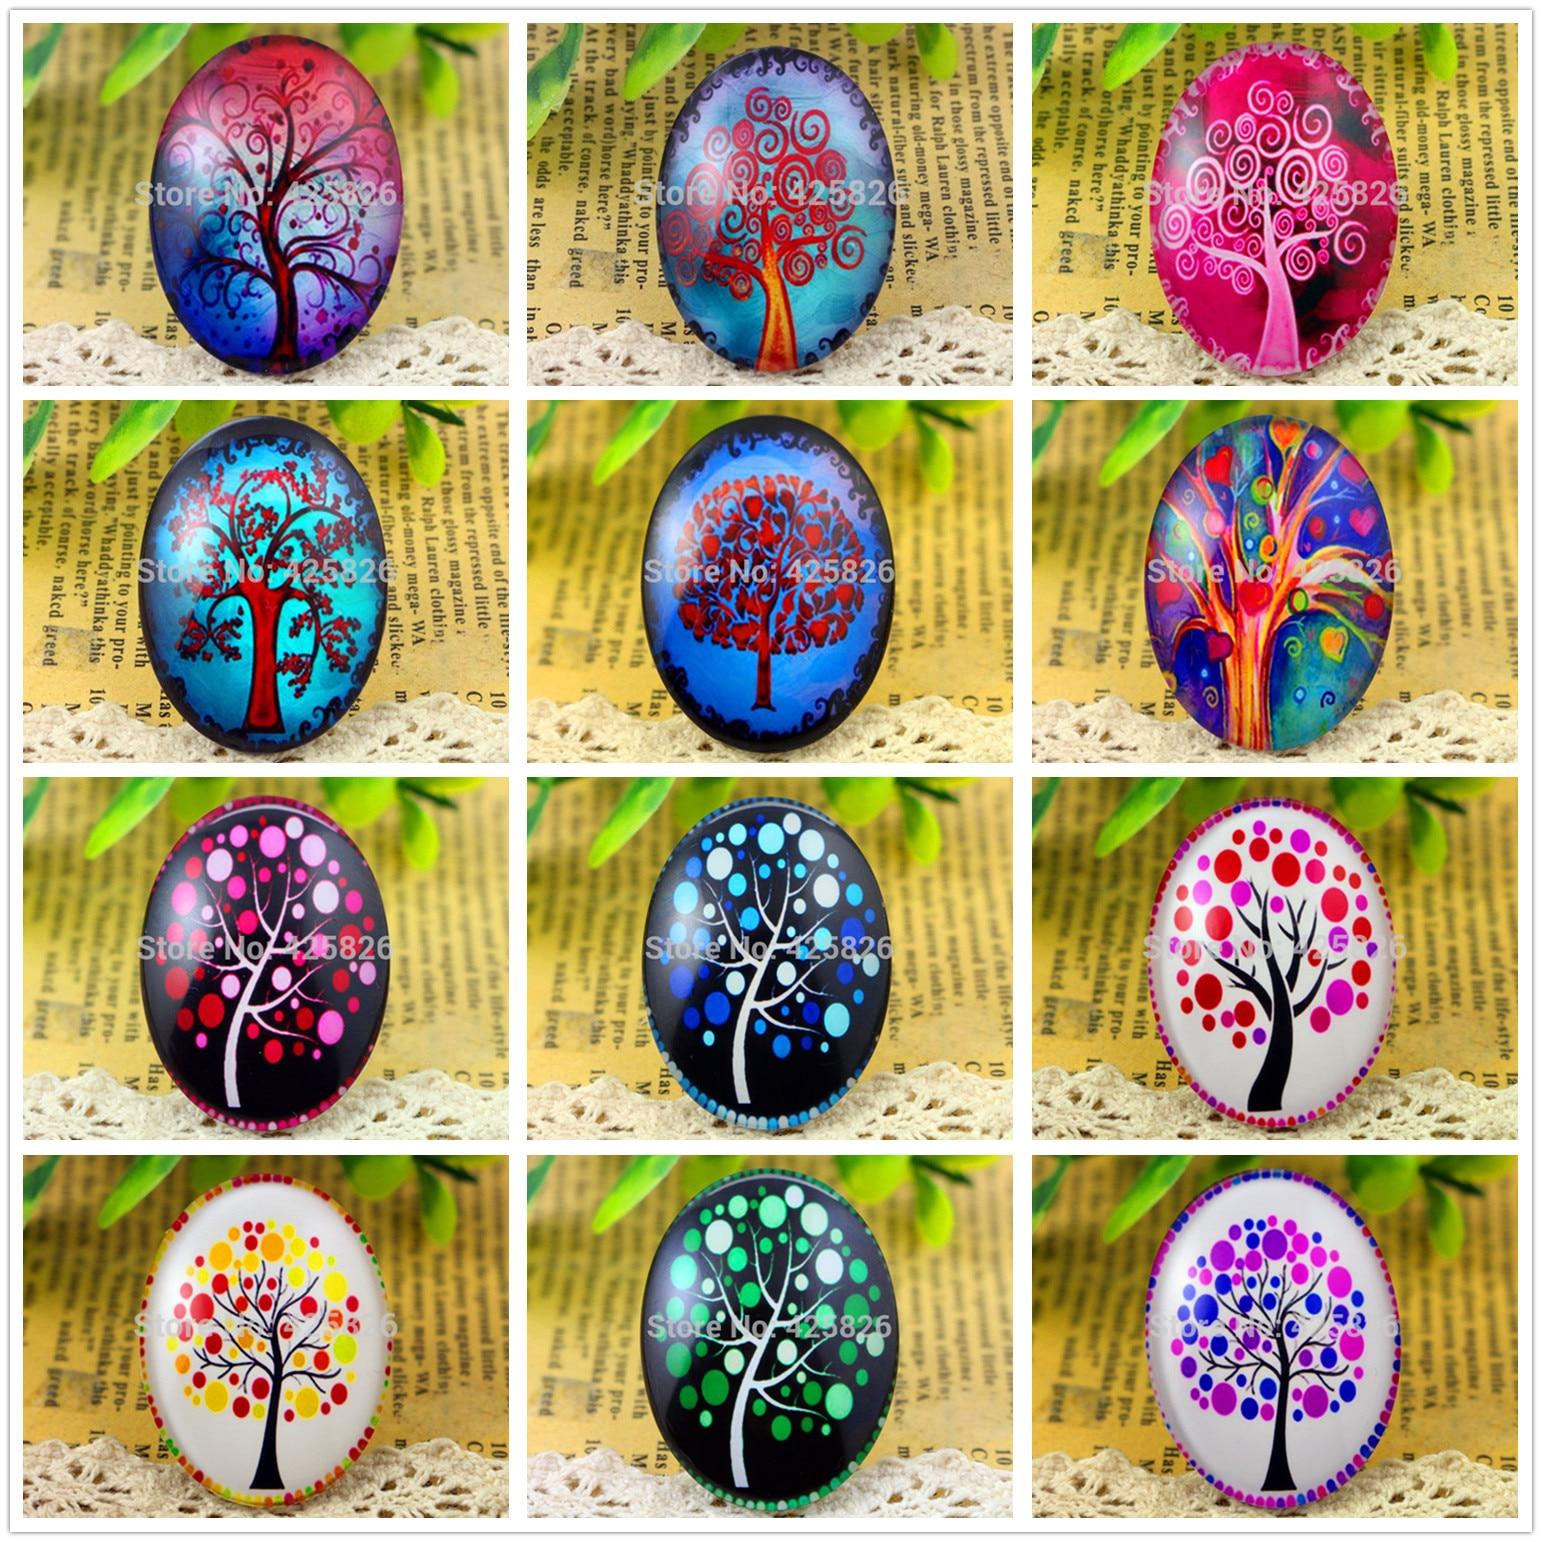 New Fashion  2pcs 30x40mm Energy Tree Life Tree Handmade Photo Glass Cabochons (Color Tree Series)